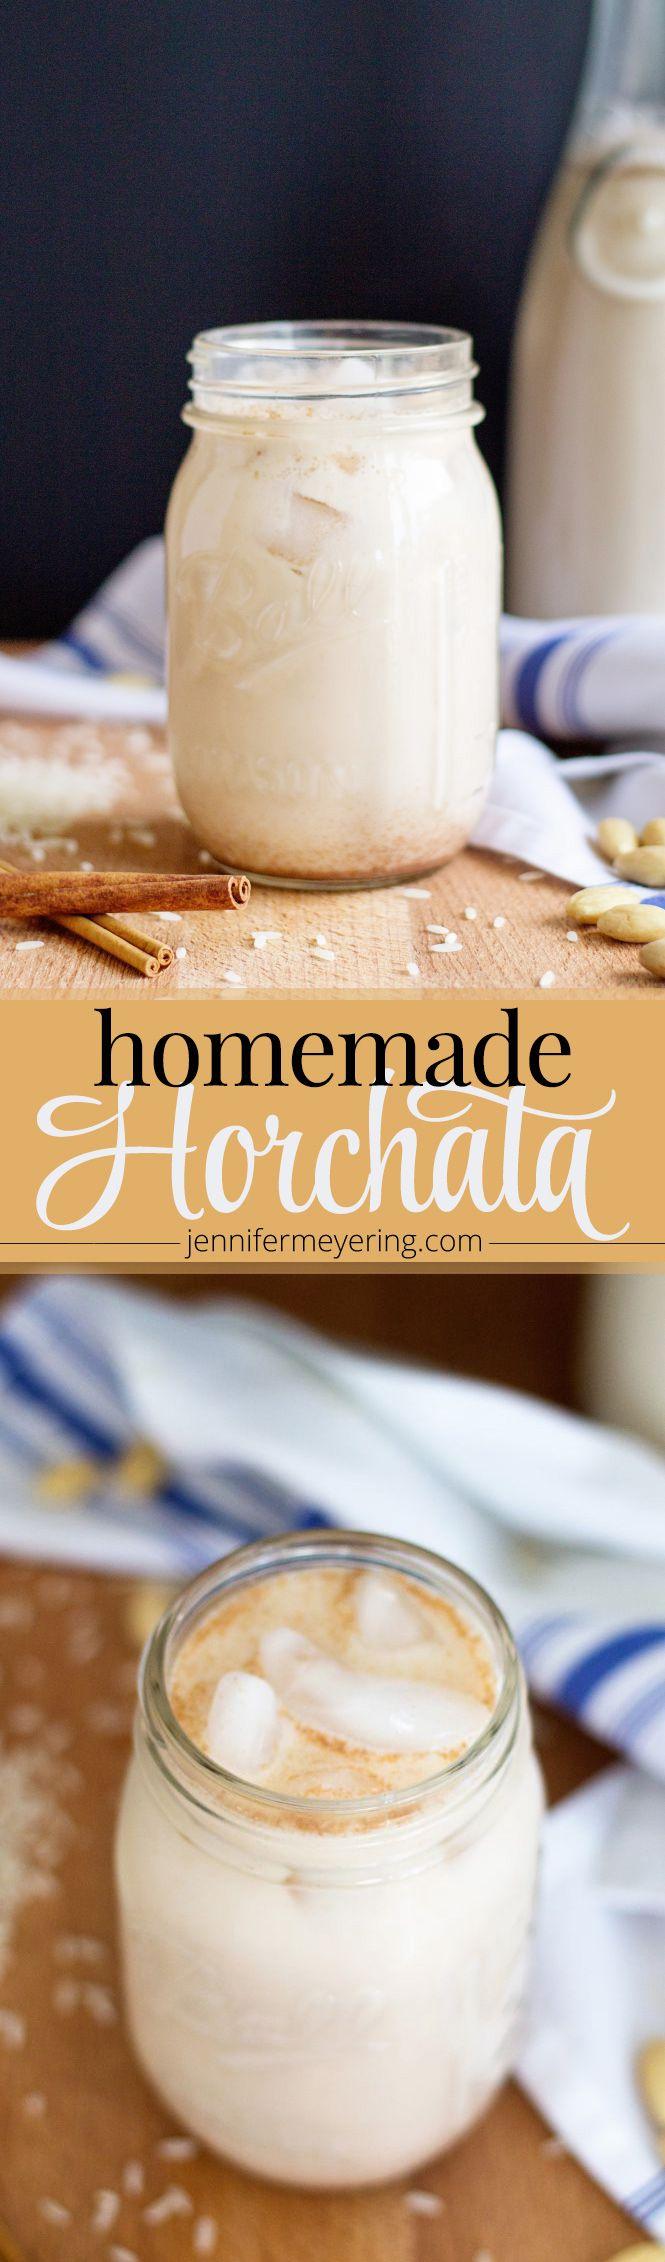 Homemade Horchata | JenniferMeyering.com